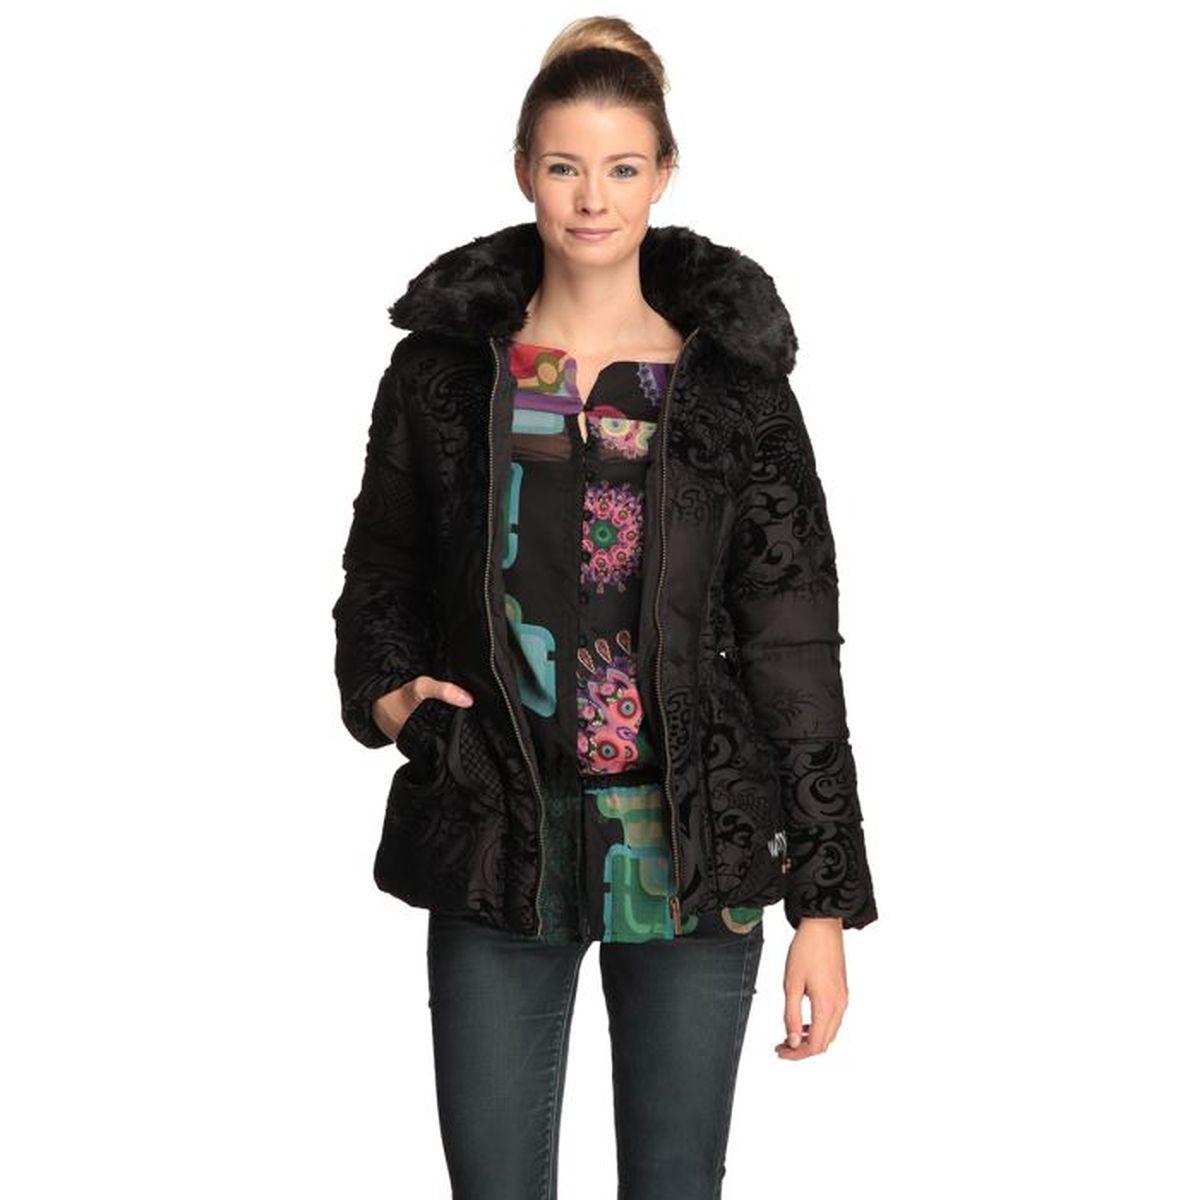 79159d57e144ee DESIGUAL Doudoune Femme Rocio Noir - Achat / Vente doudoune - Soldes ...